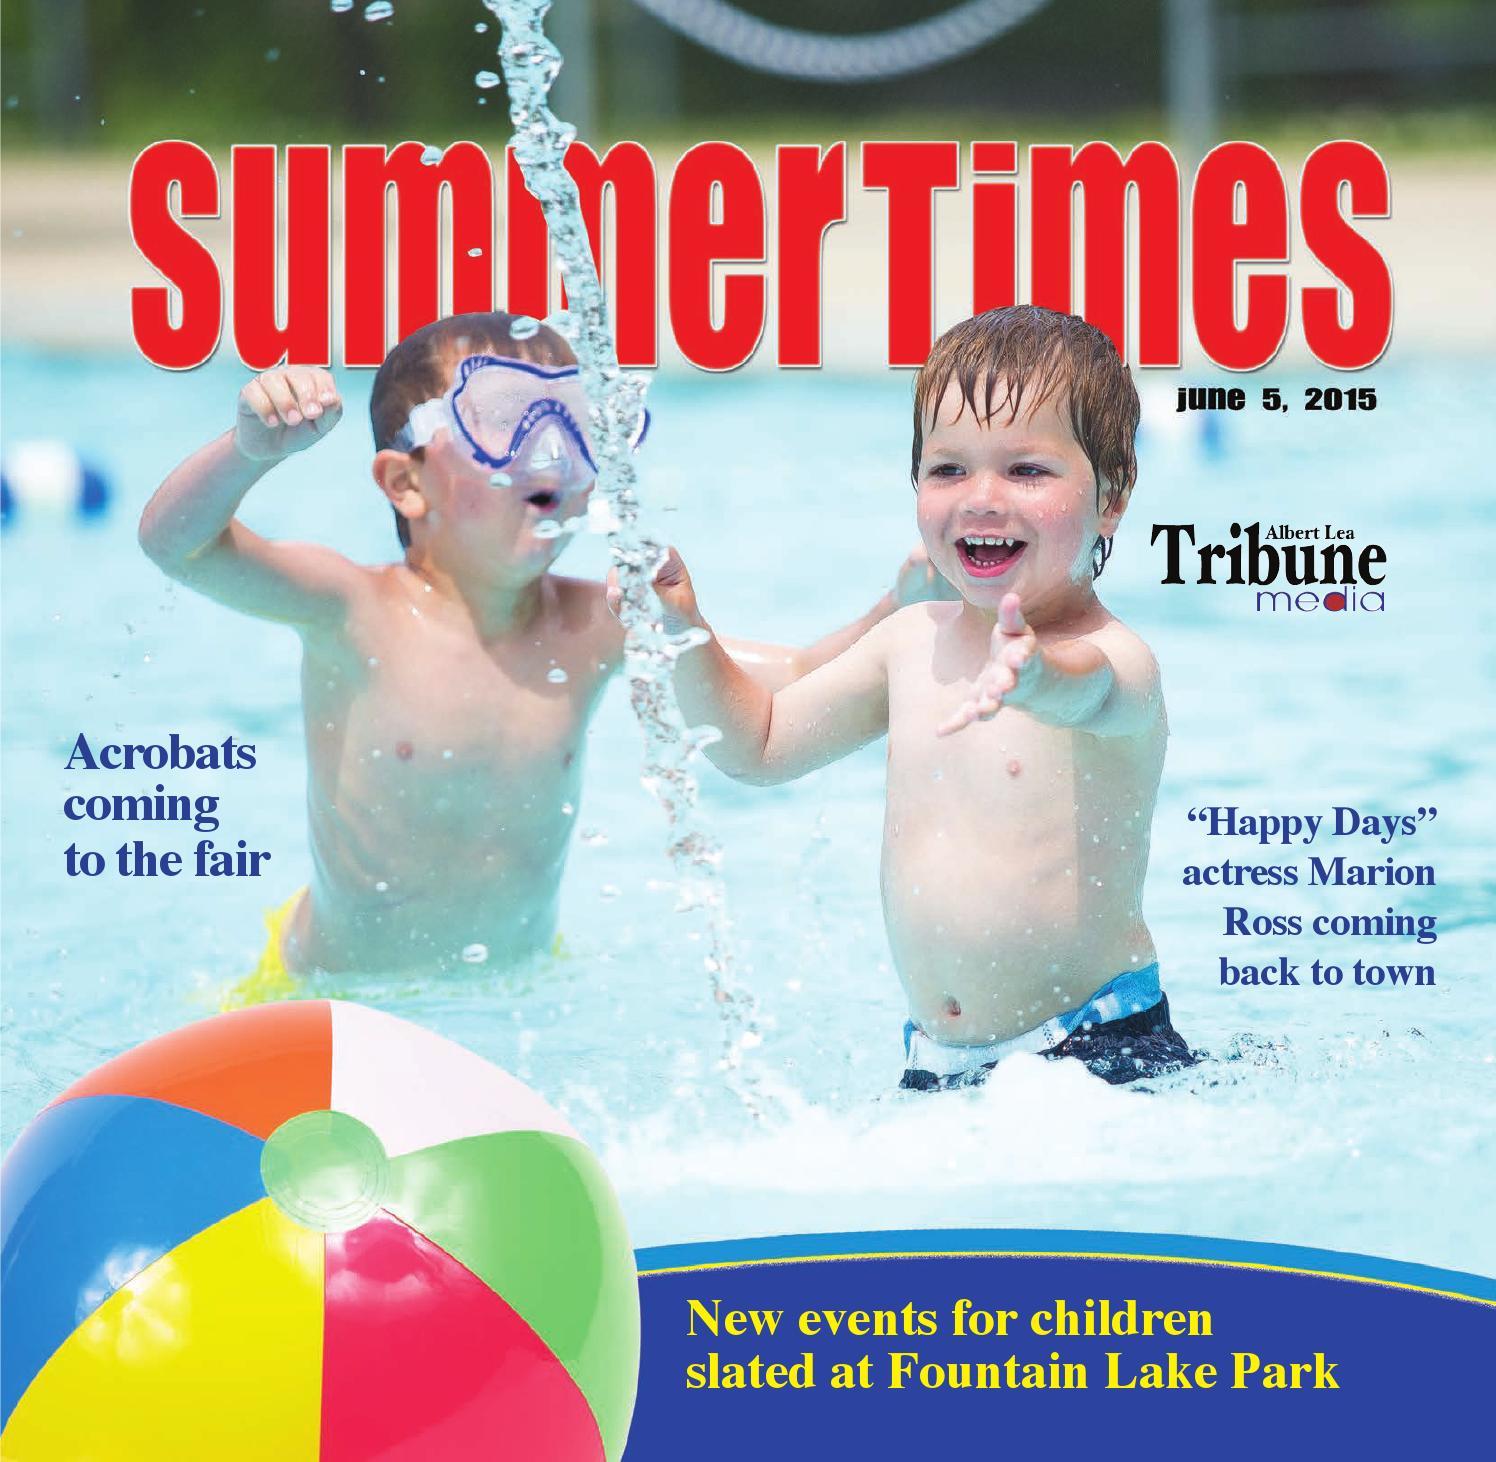 Summertimes 2015 by Albert Lea Magazine - issuu